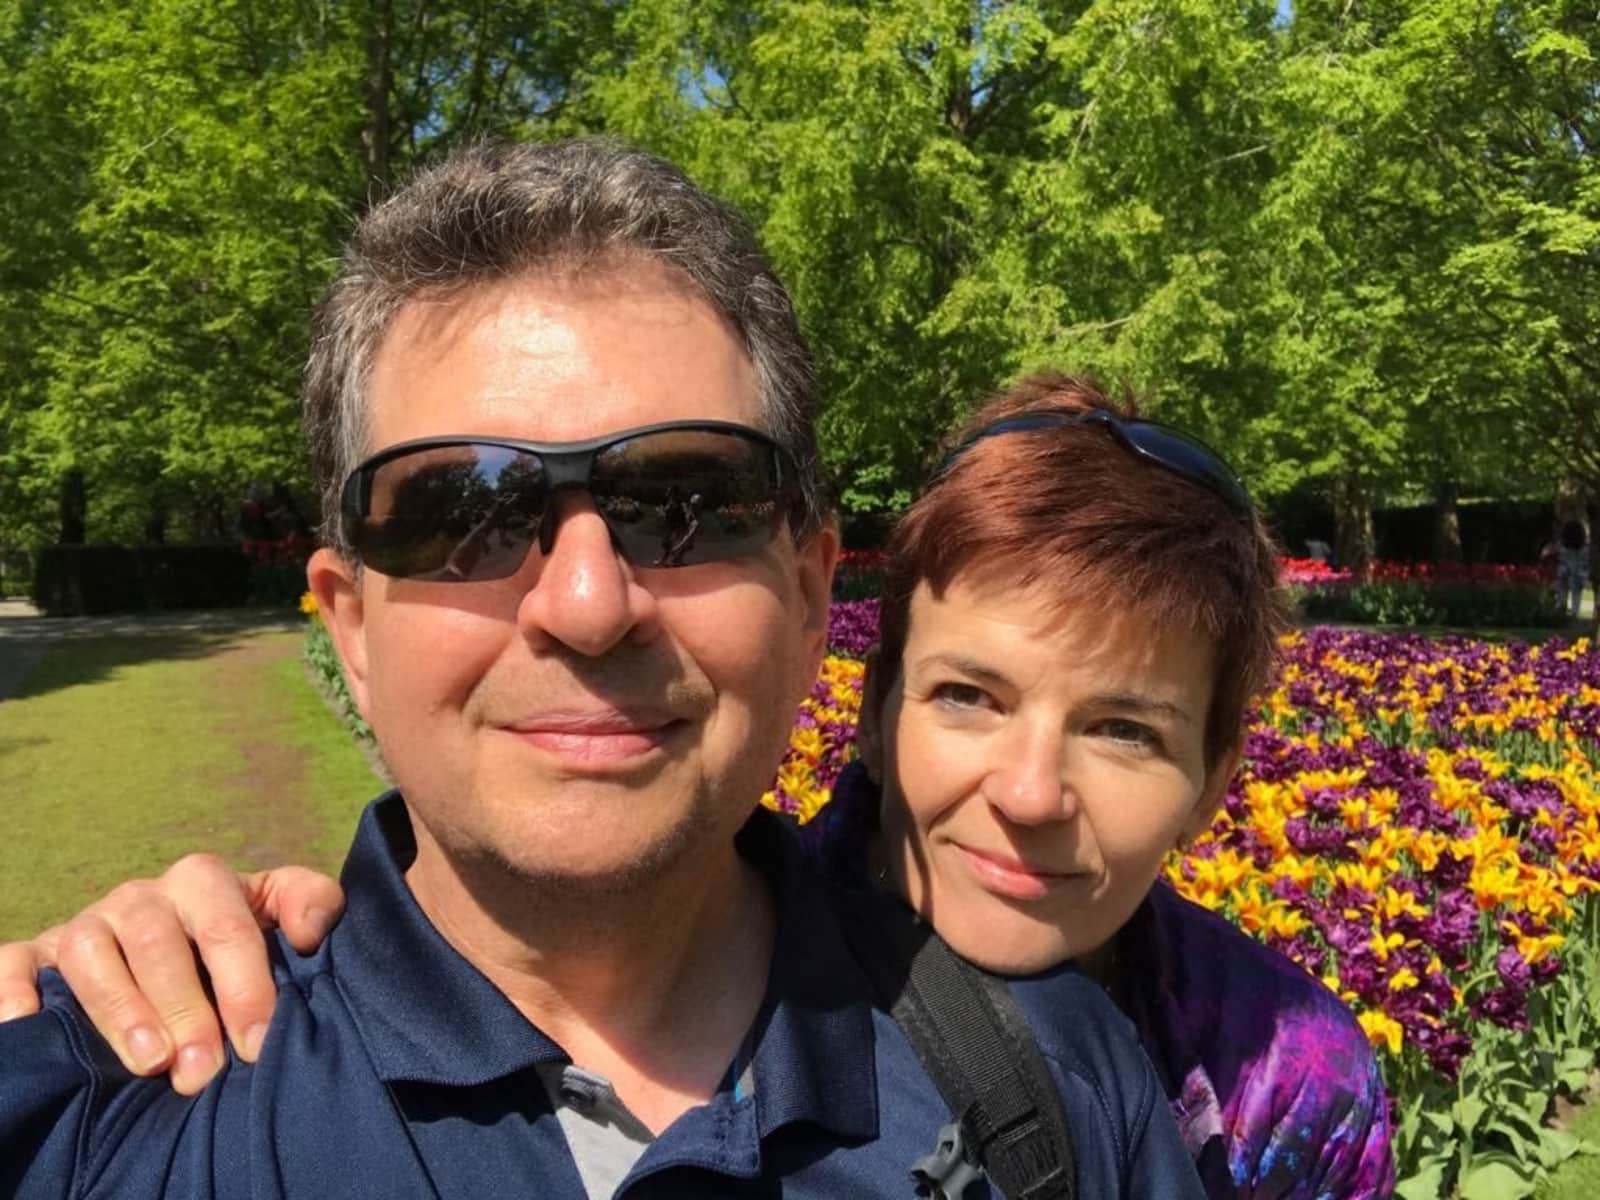 Adrienne & Robert from Calgary, Alberta, Canada